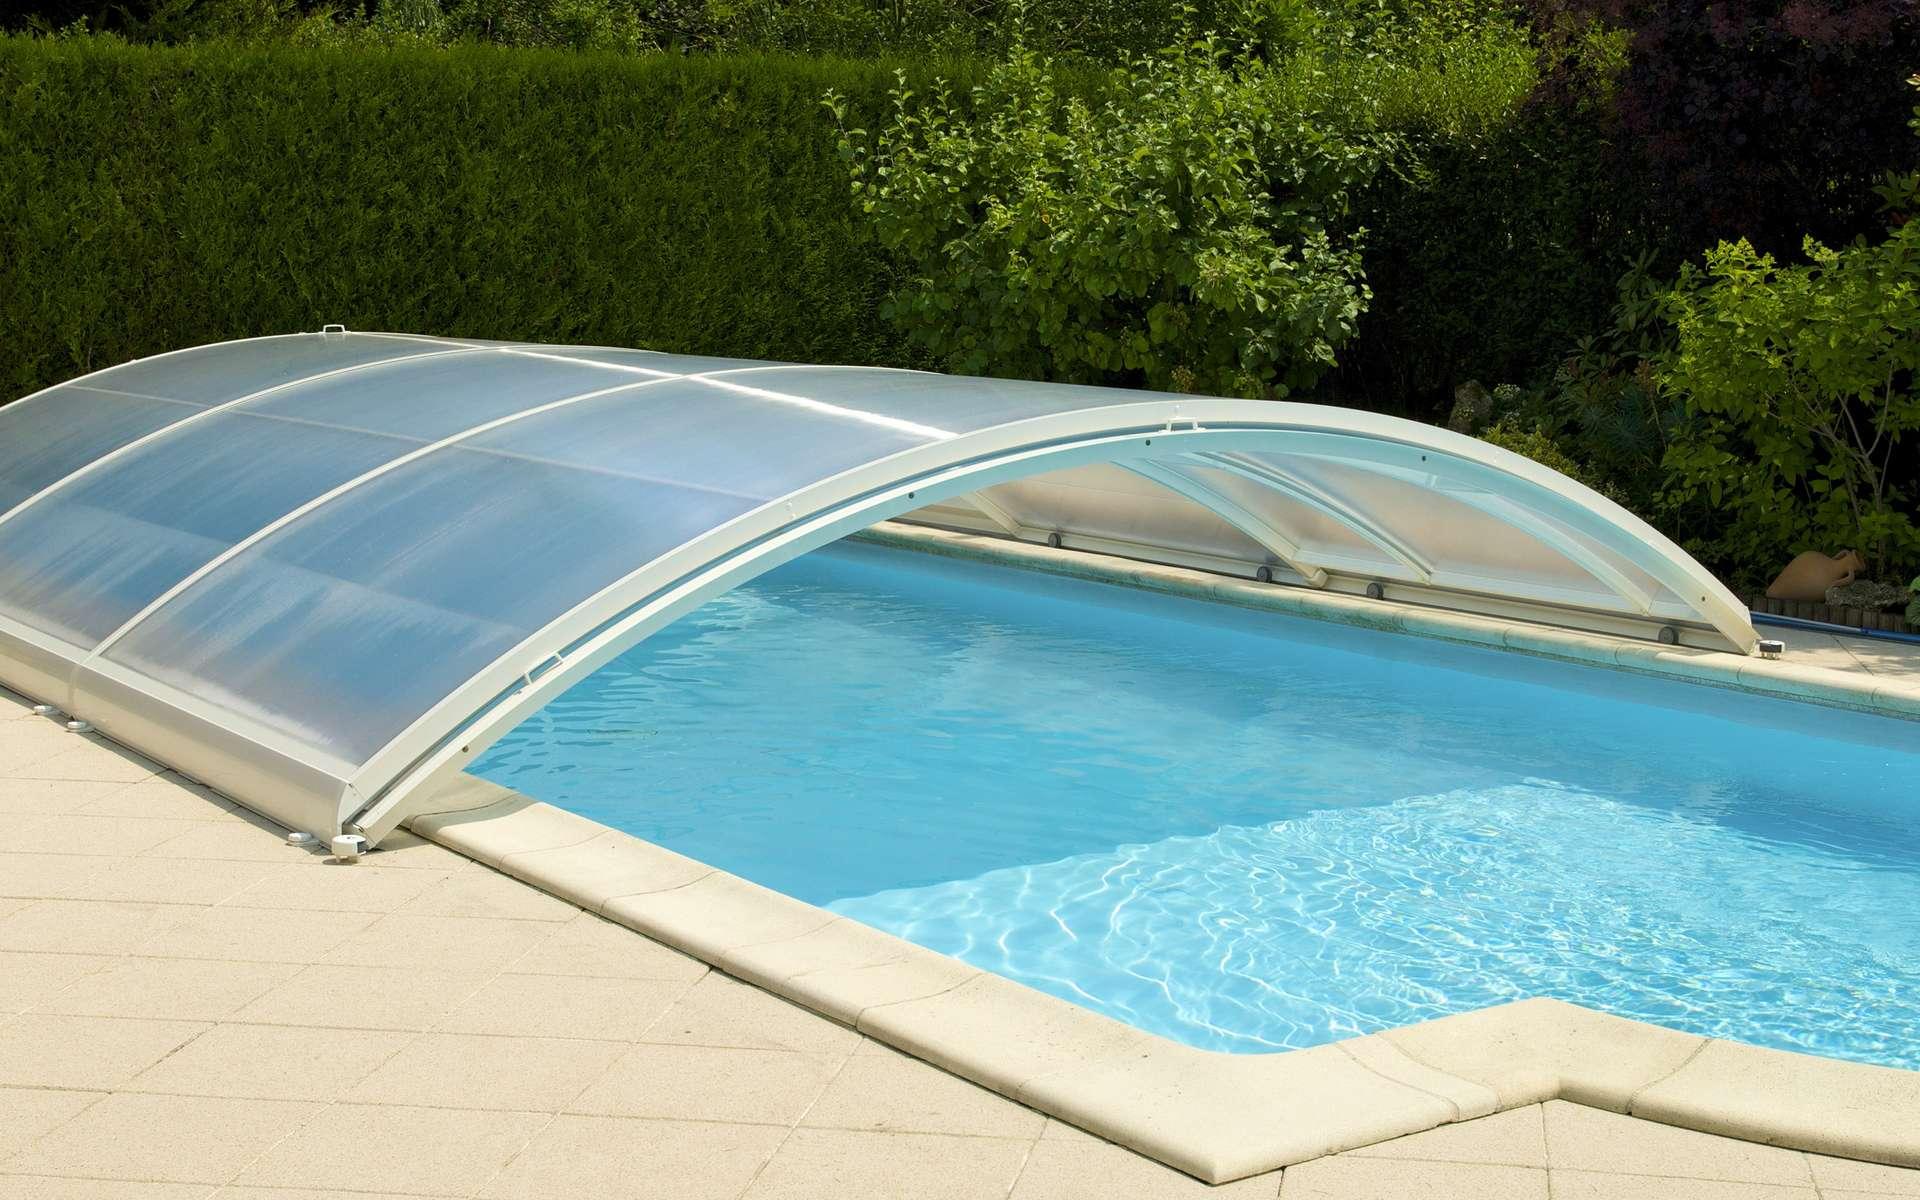 Abri de piscine © AlcelVision, AdobeStock